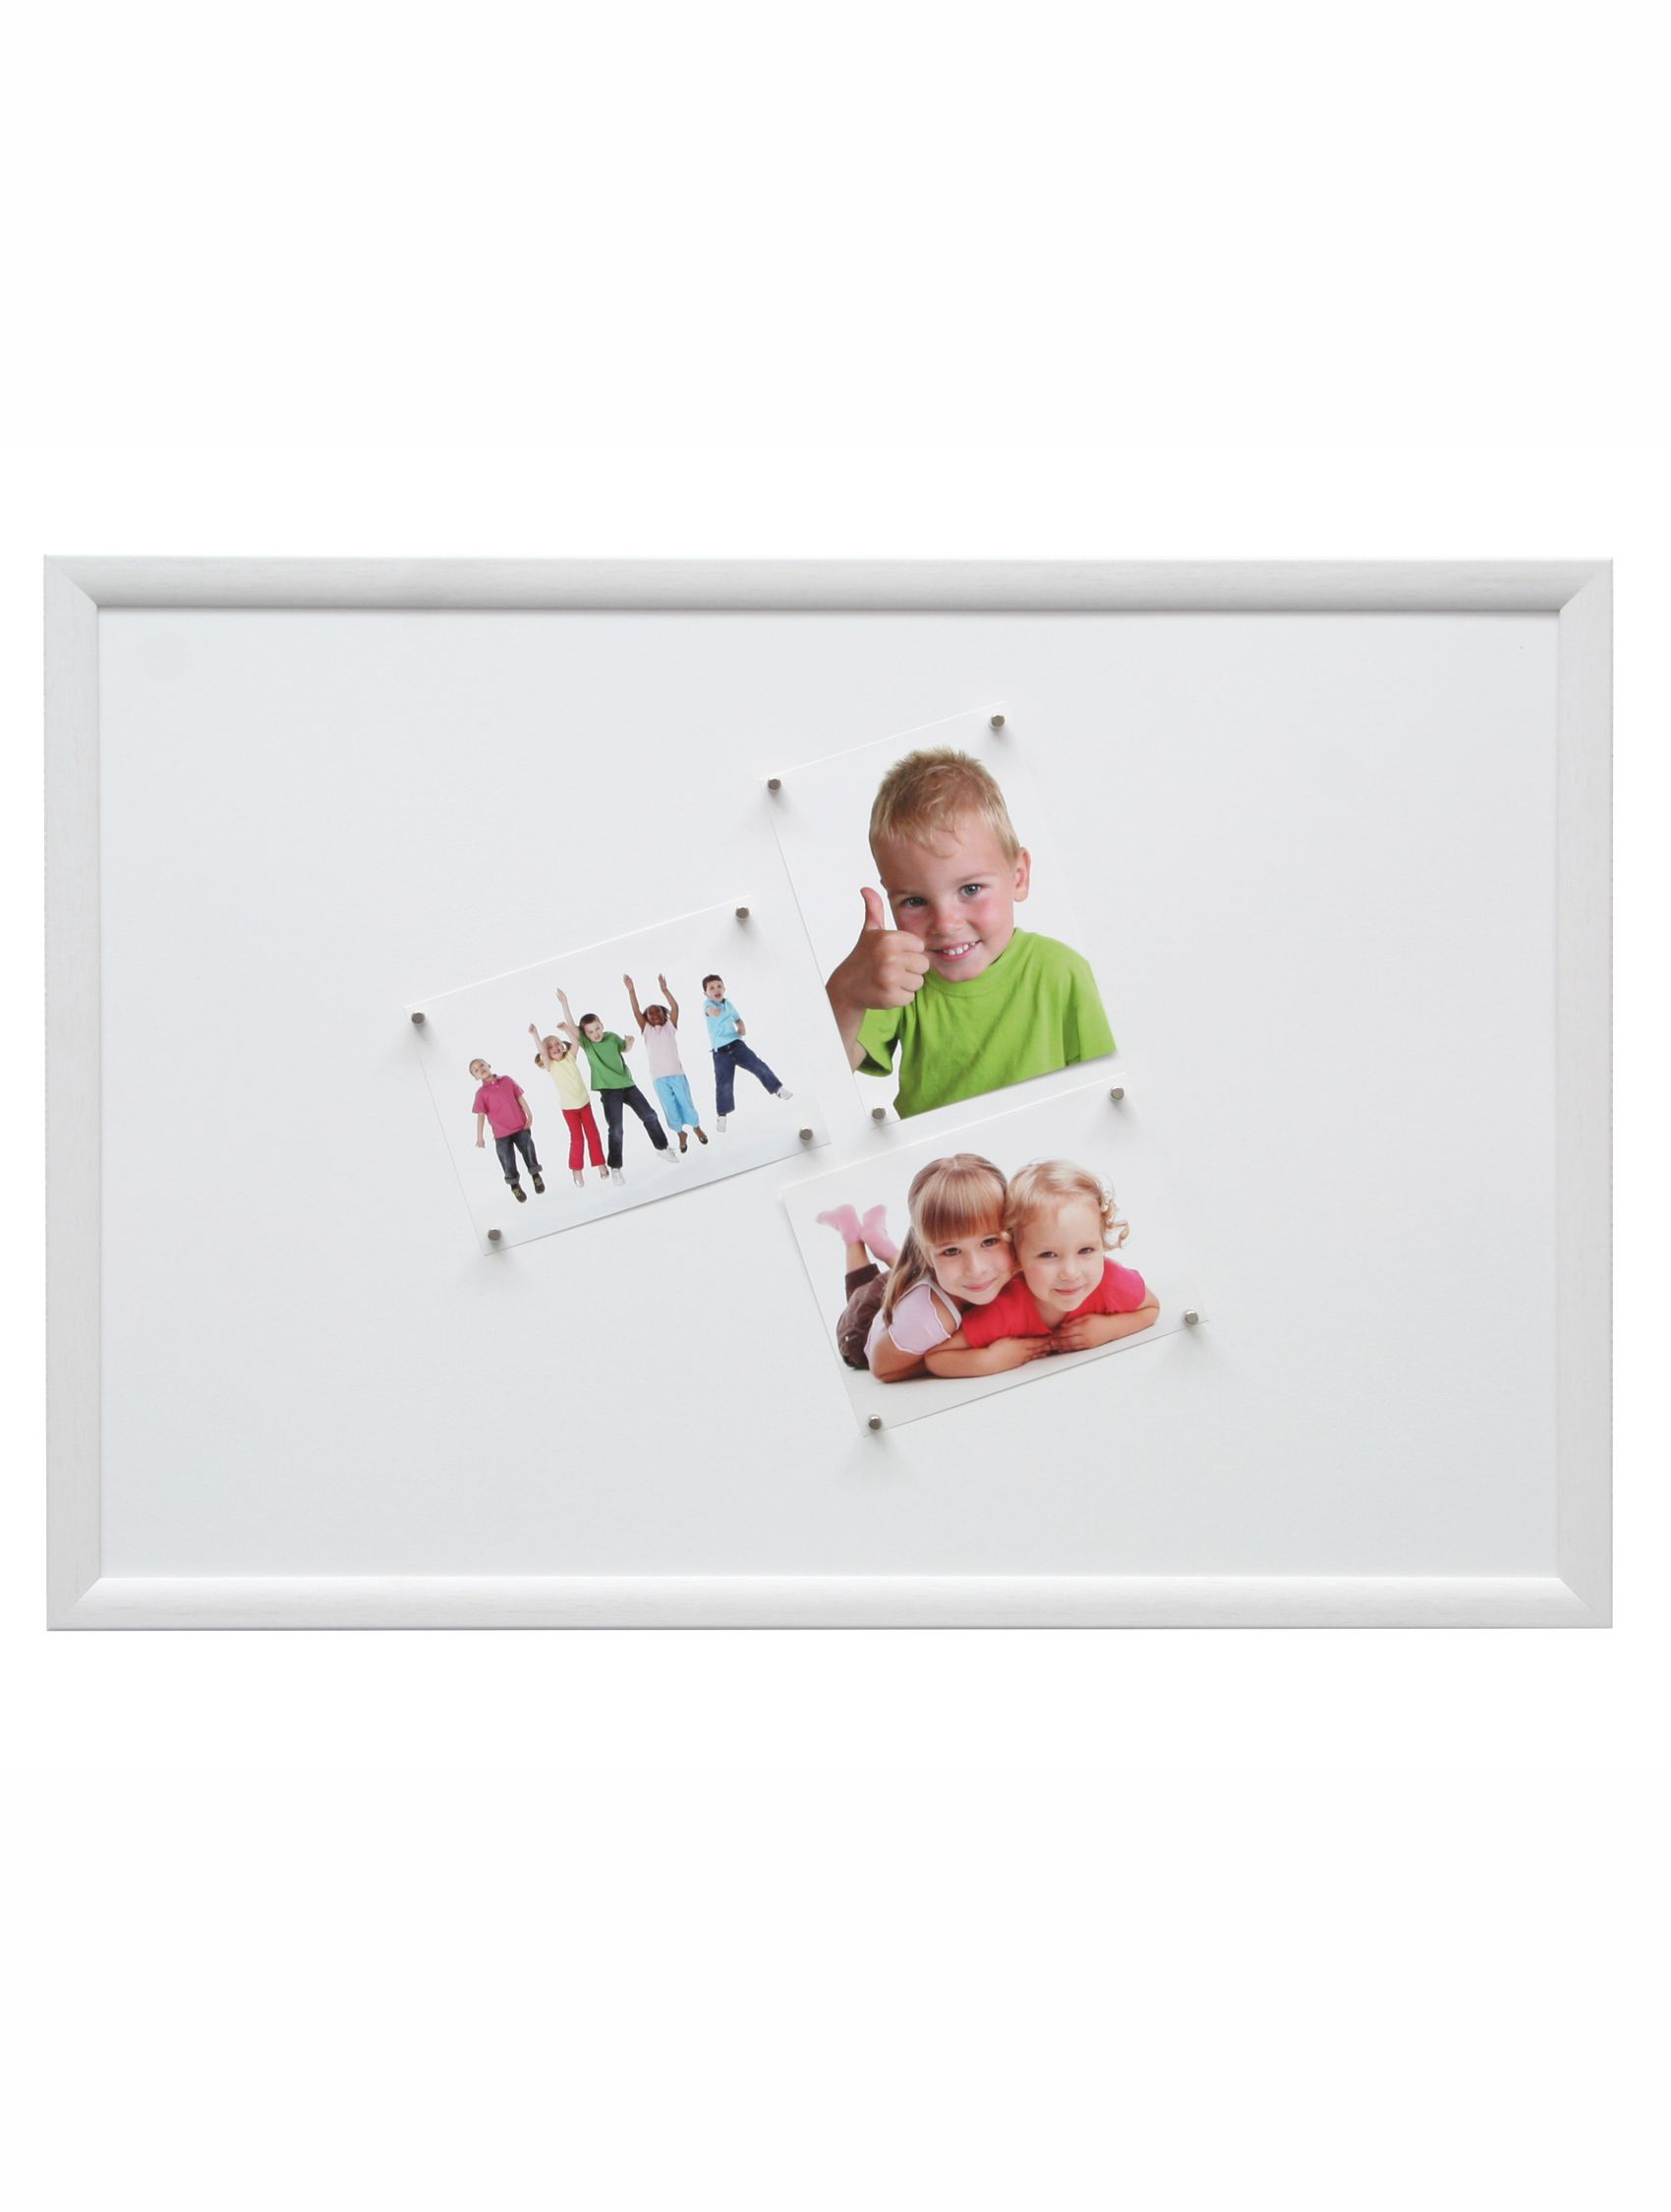 Magneetbord wit schilderlook, S54SF1 S54ST2